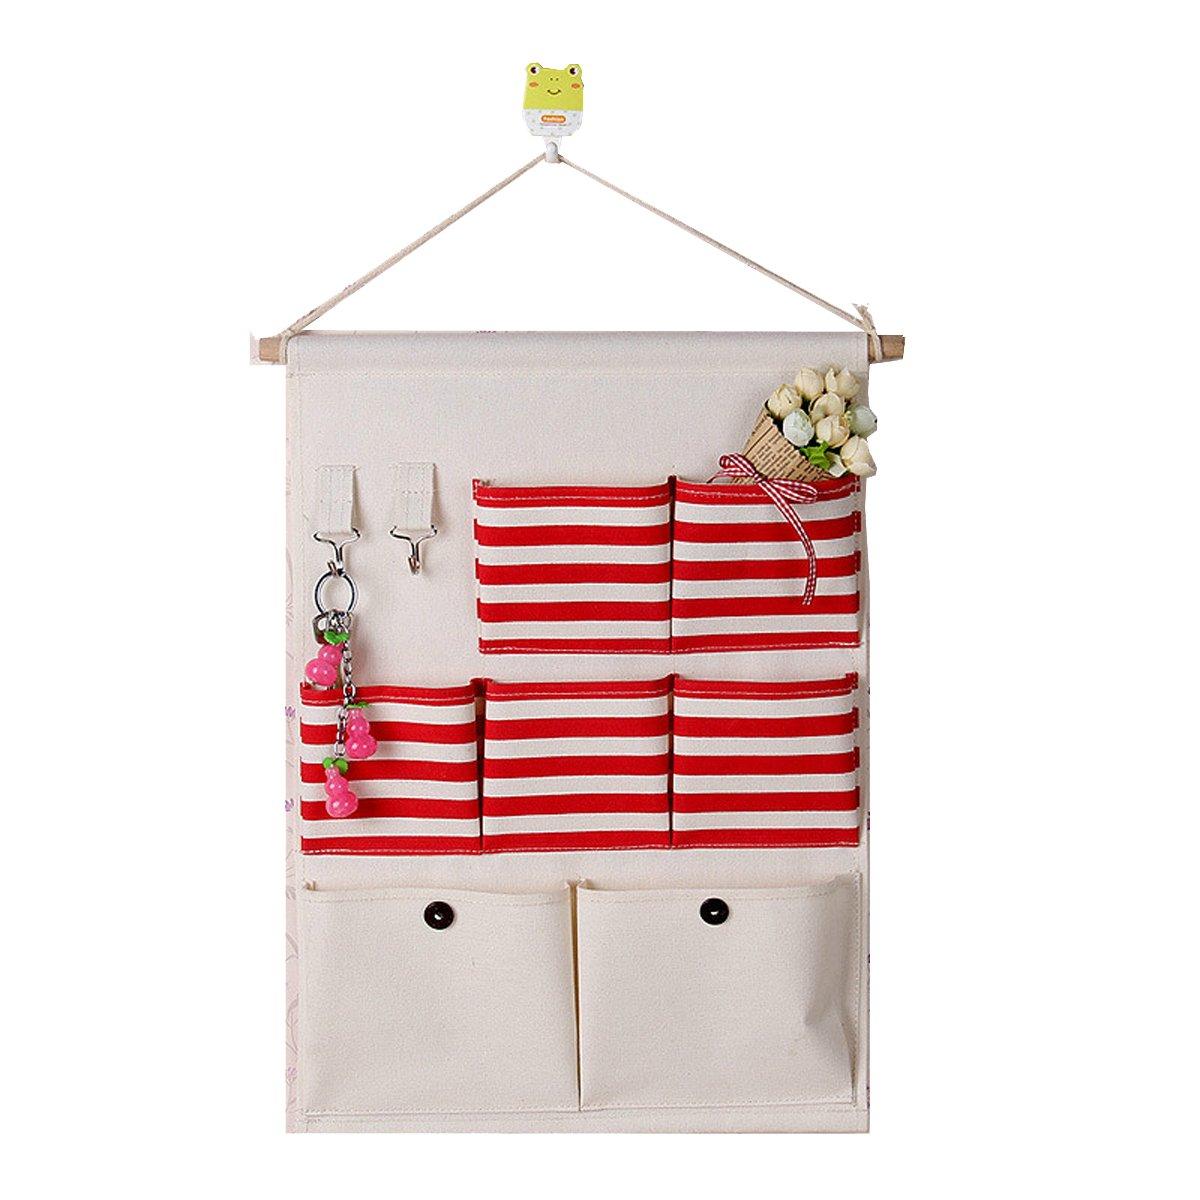 Hanging Organizer, Makone 7 Pockets Cotton Fabric Storage Bag Wall Door Closet Home Organizer (Red Strip)